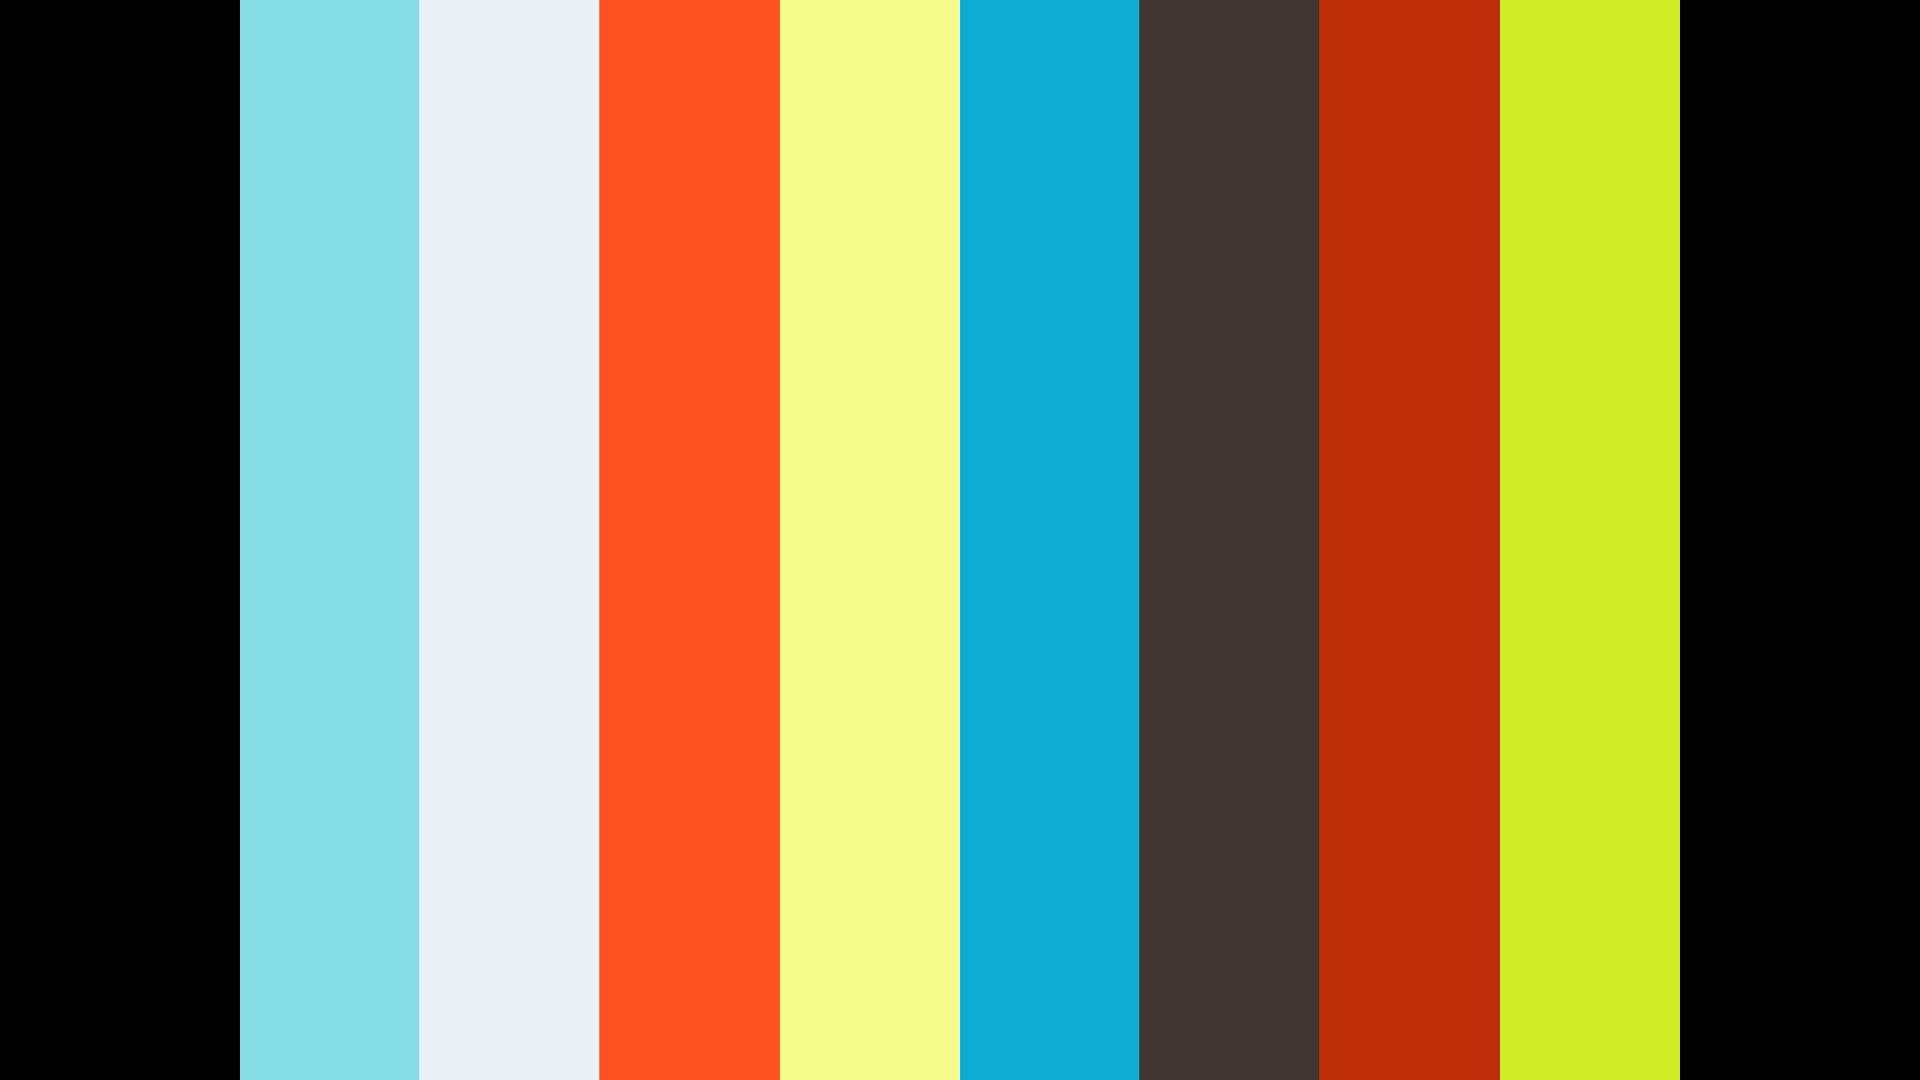 2021_06_21 - Brad - SCOOP 1k Series Saver Part 8